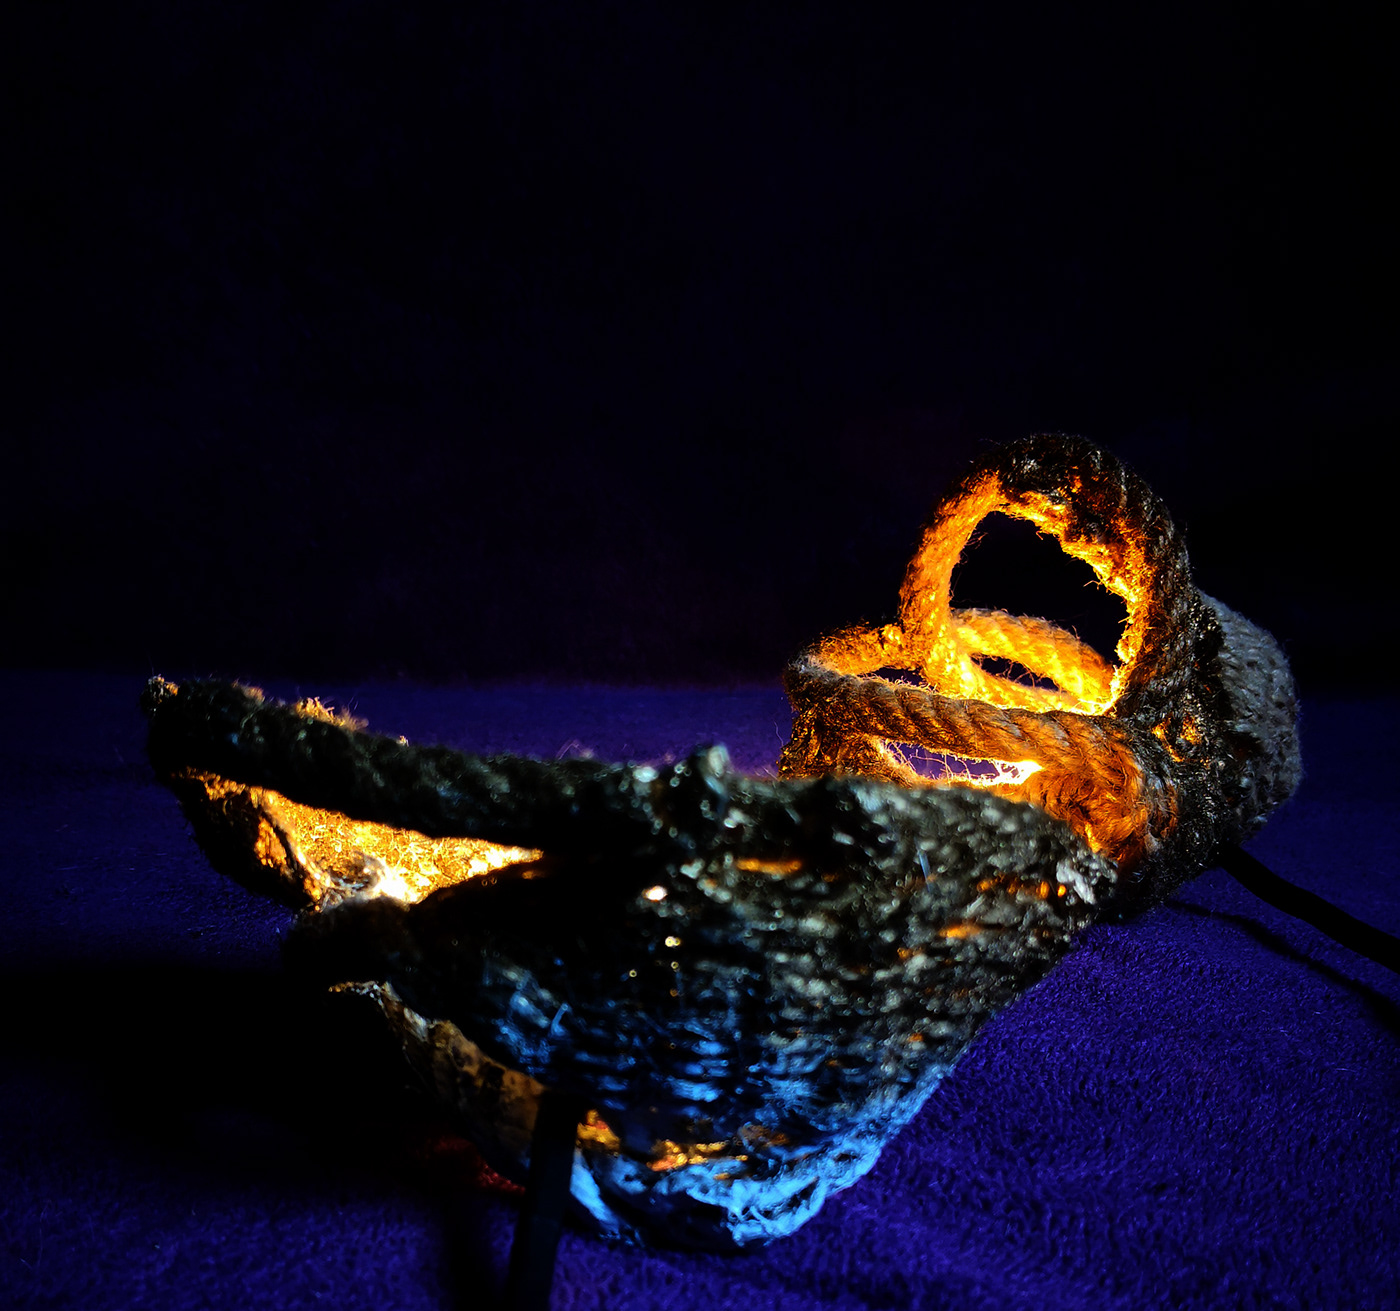 rope Lamp textile art Metamorphosis design product night light ambiental golden blossom